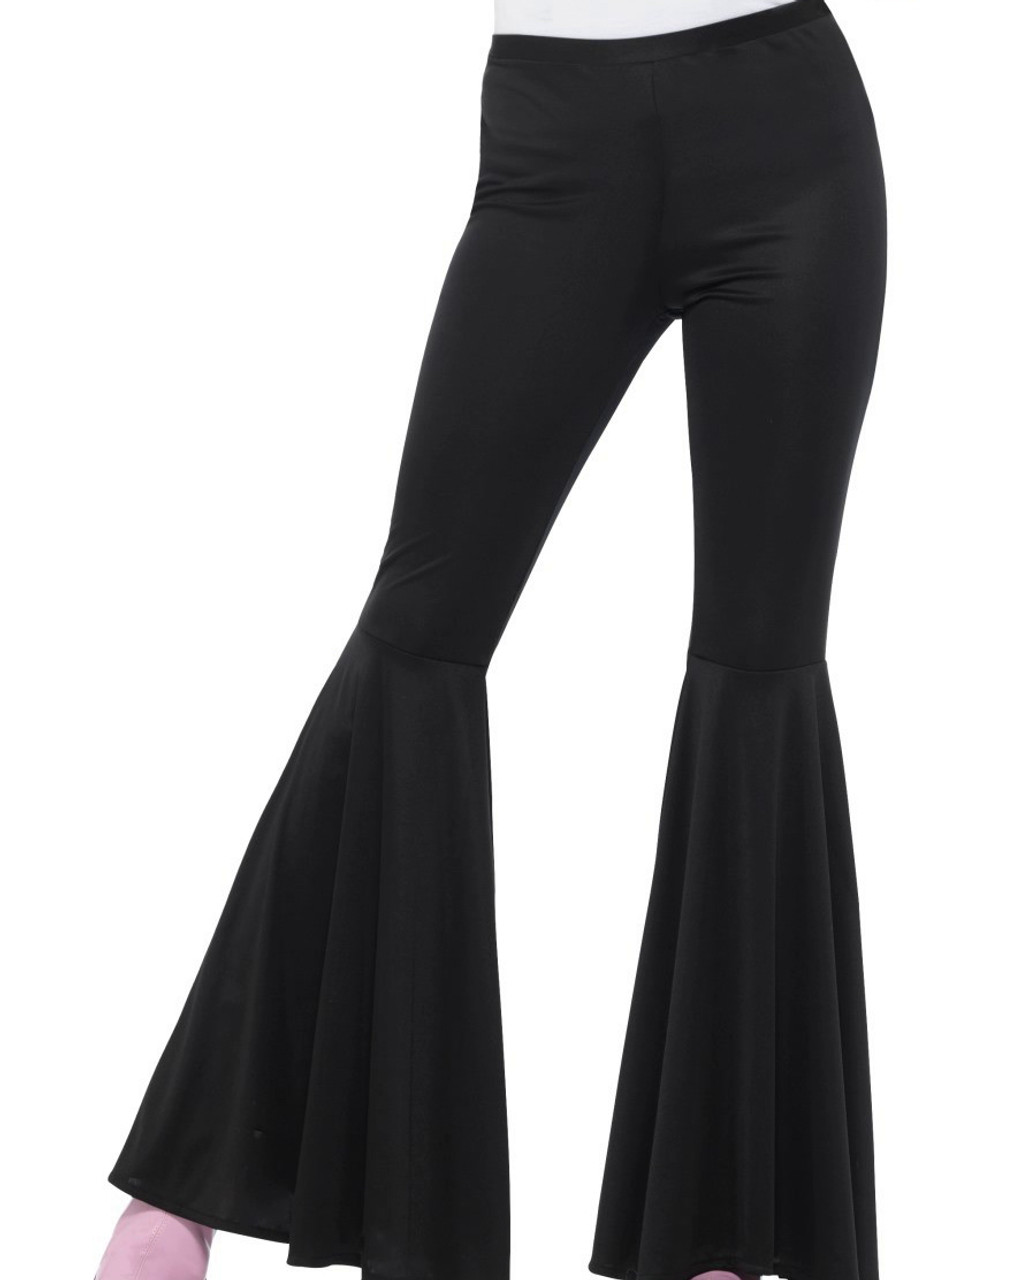 MENS BLACK 1970/'S DISCO TROUSERS PANTS FANCY DRESS COSTUME FLARES 70S 1960/'S 60S